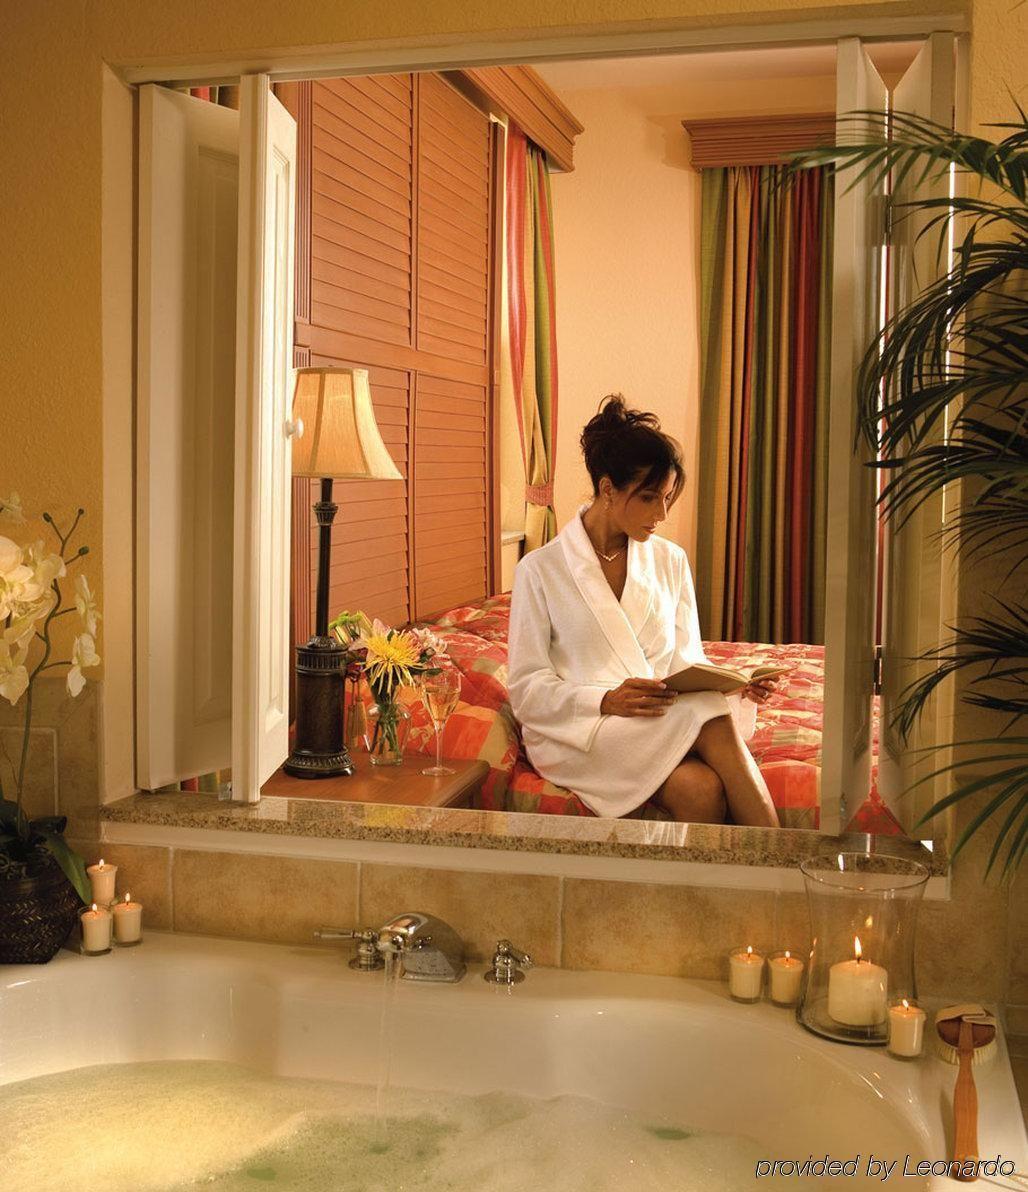 Hotel Floridays Resort Orlando, Orlando, United States